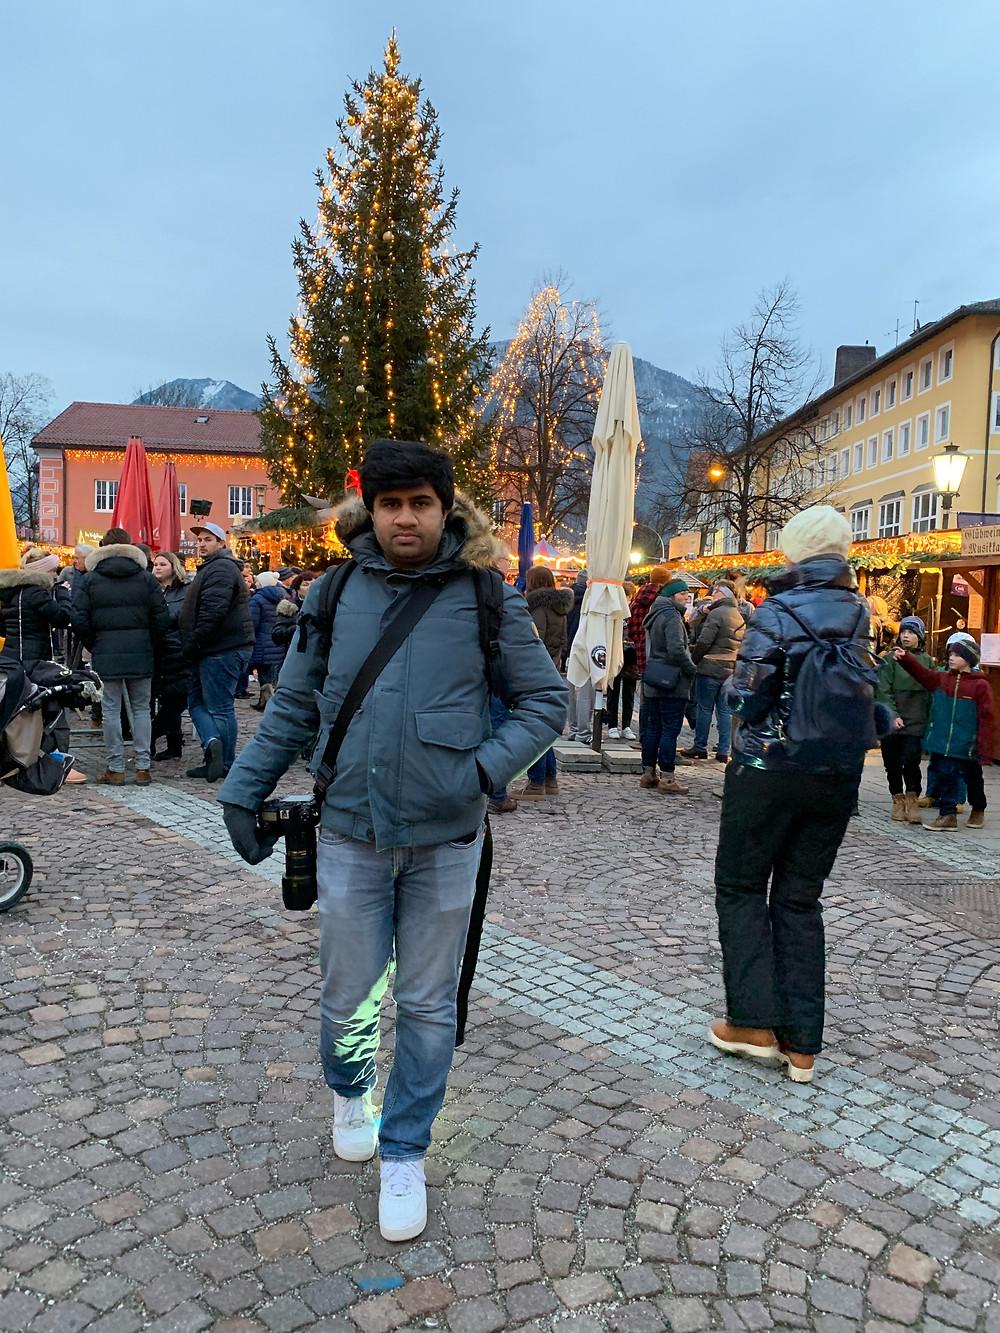 Christmas Market in Bavaria, Germany